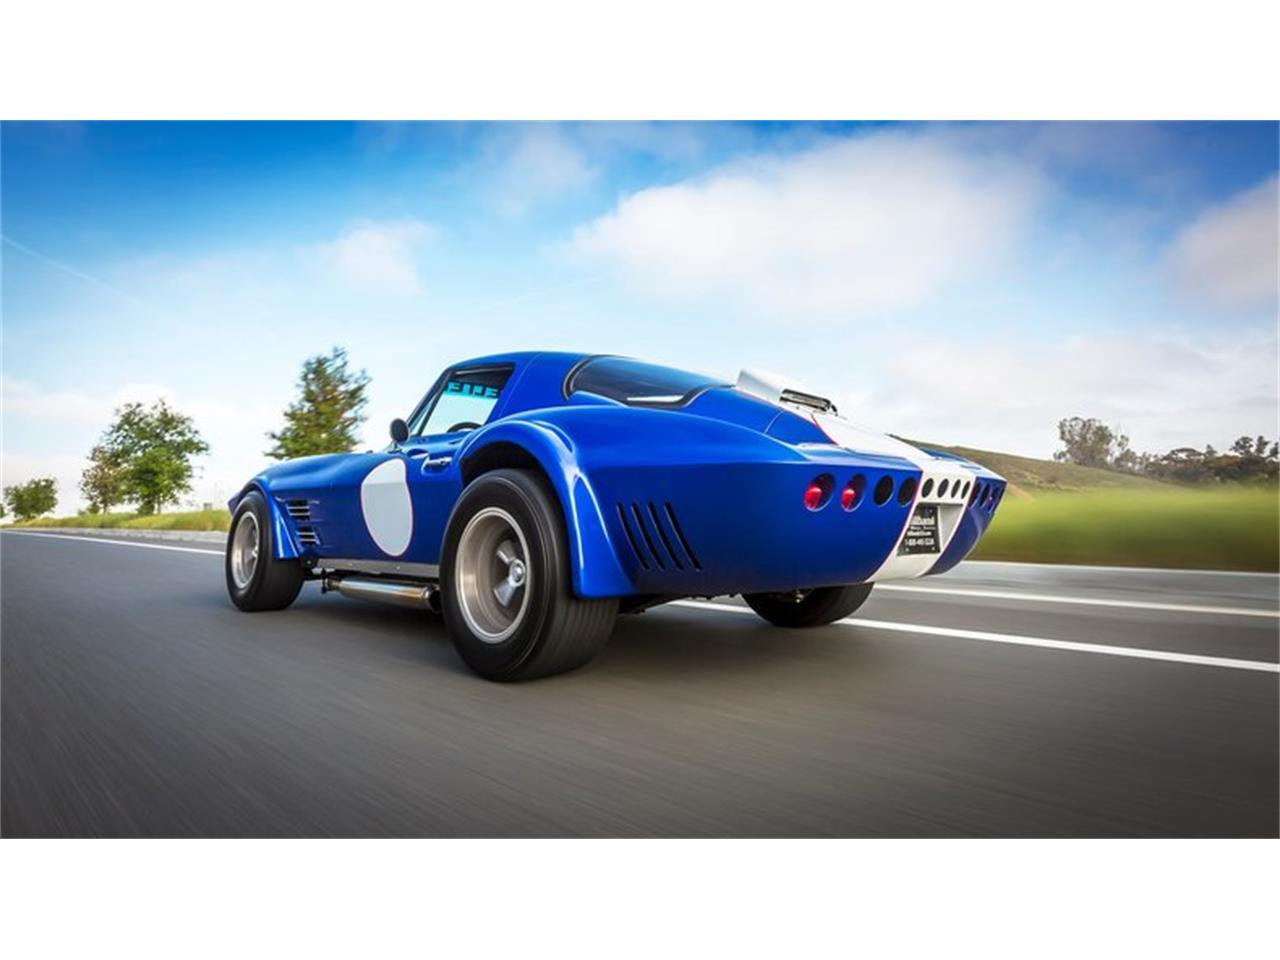 1963 Superformance Corvette Grand Sport (CC-1197311) for sale in Irvine, California